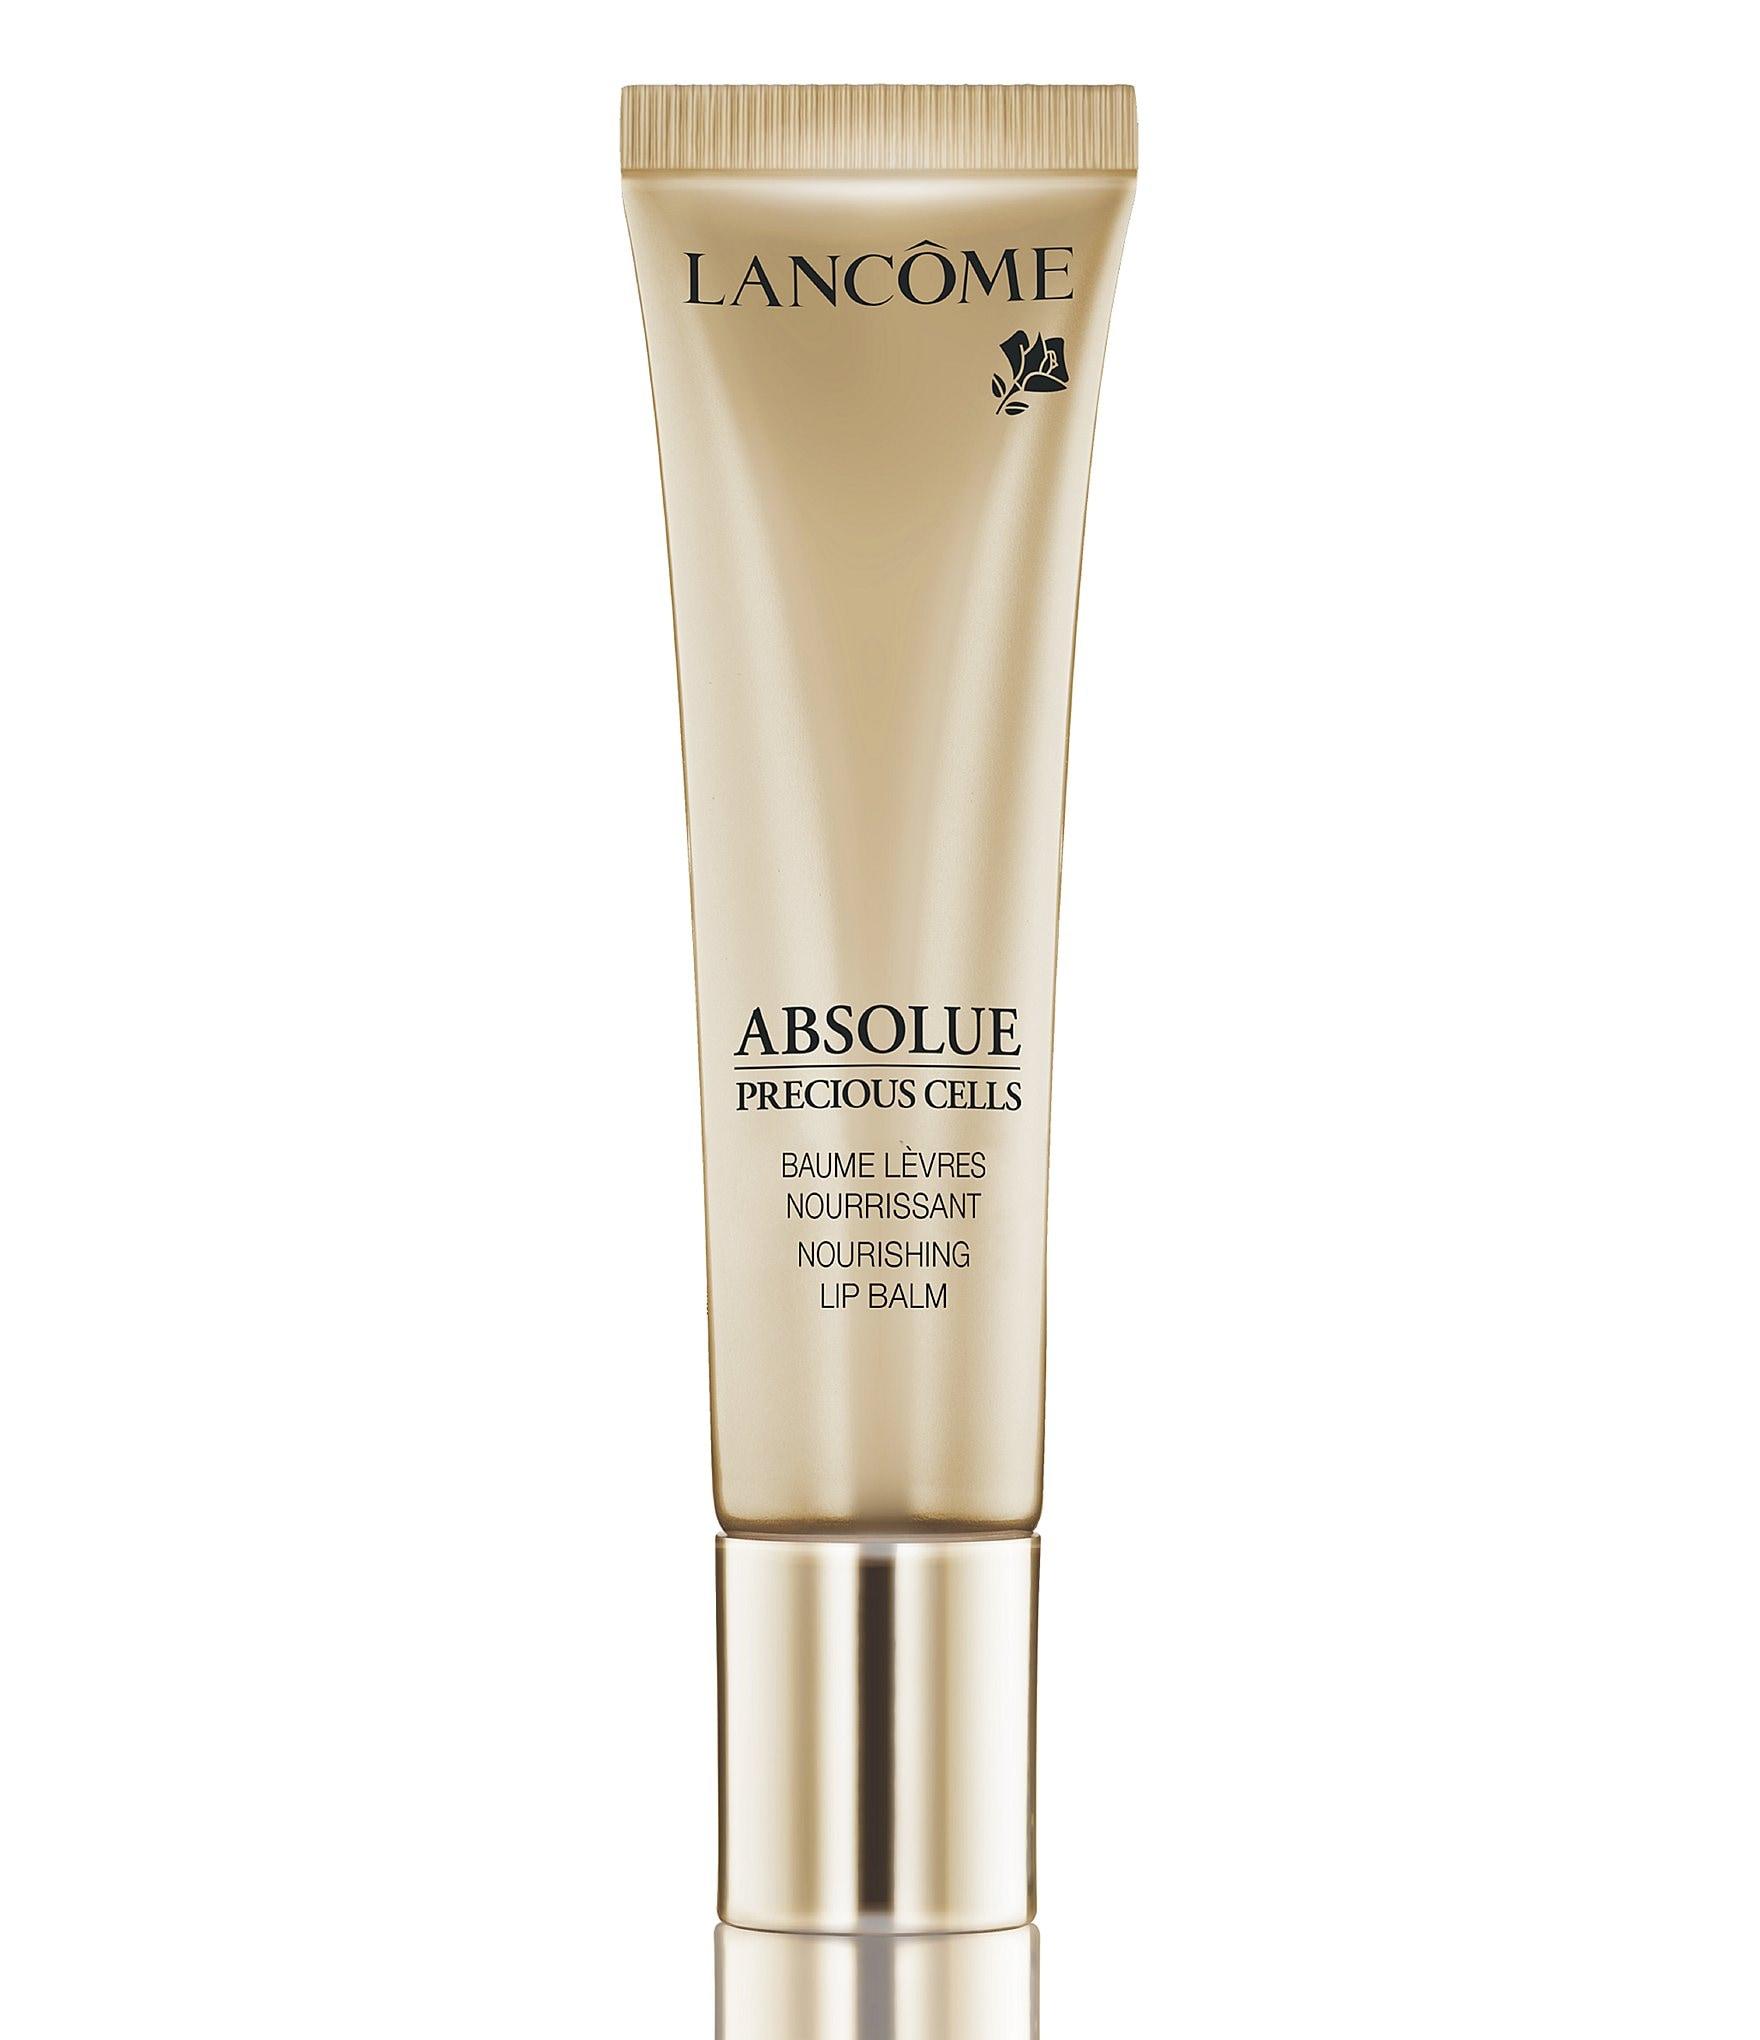 Lancome Absolue Precious Cells Nourishing Lip Balm Dillards